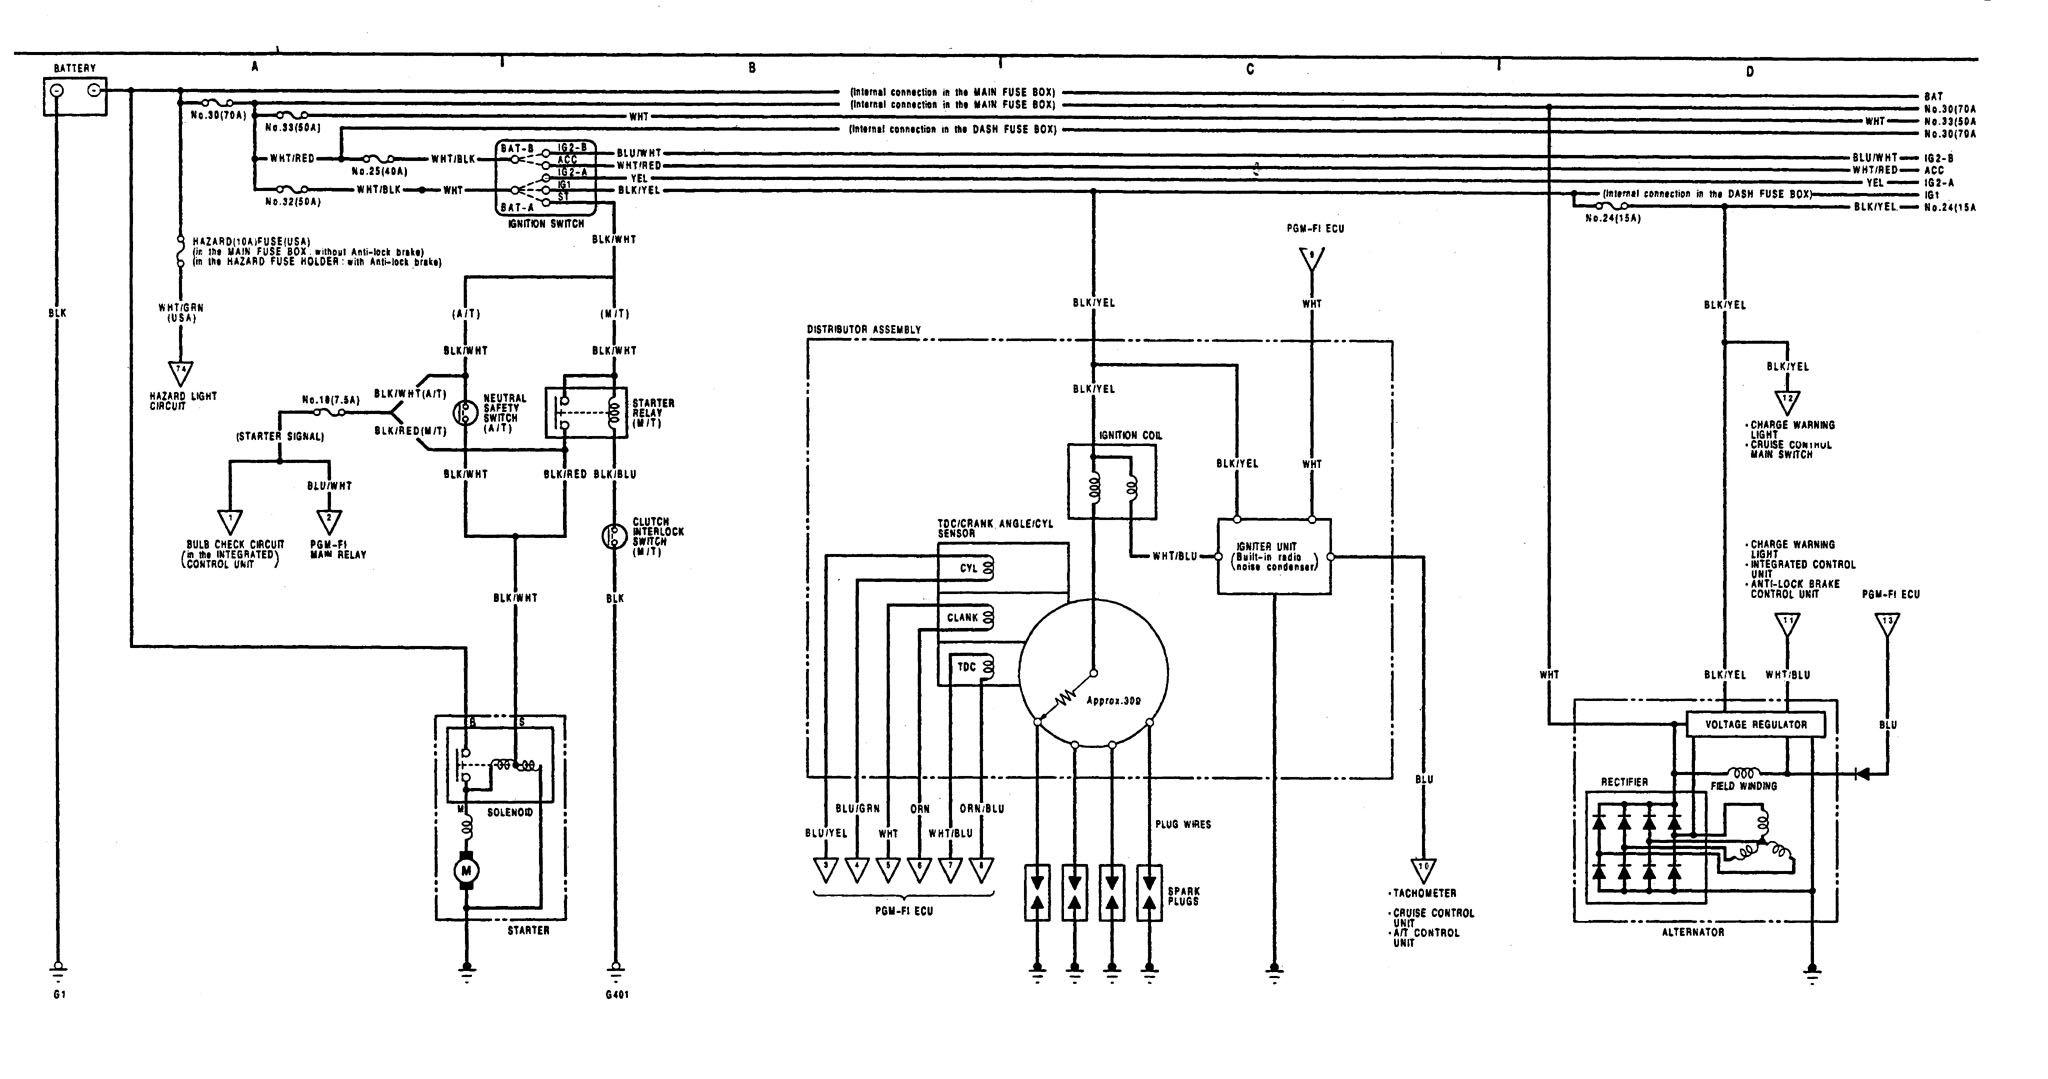 DIAGRAM] Wiring Diagram For 1991 Acura Integra FULL Version HD Quality Acura  Integra - AAWIRINGLOOM.MAMI-WATA.FRMami Wata